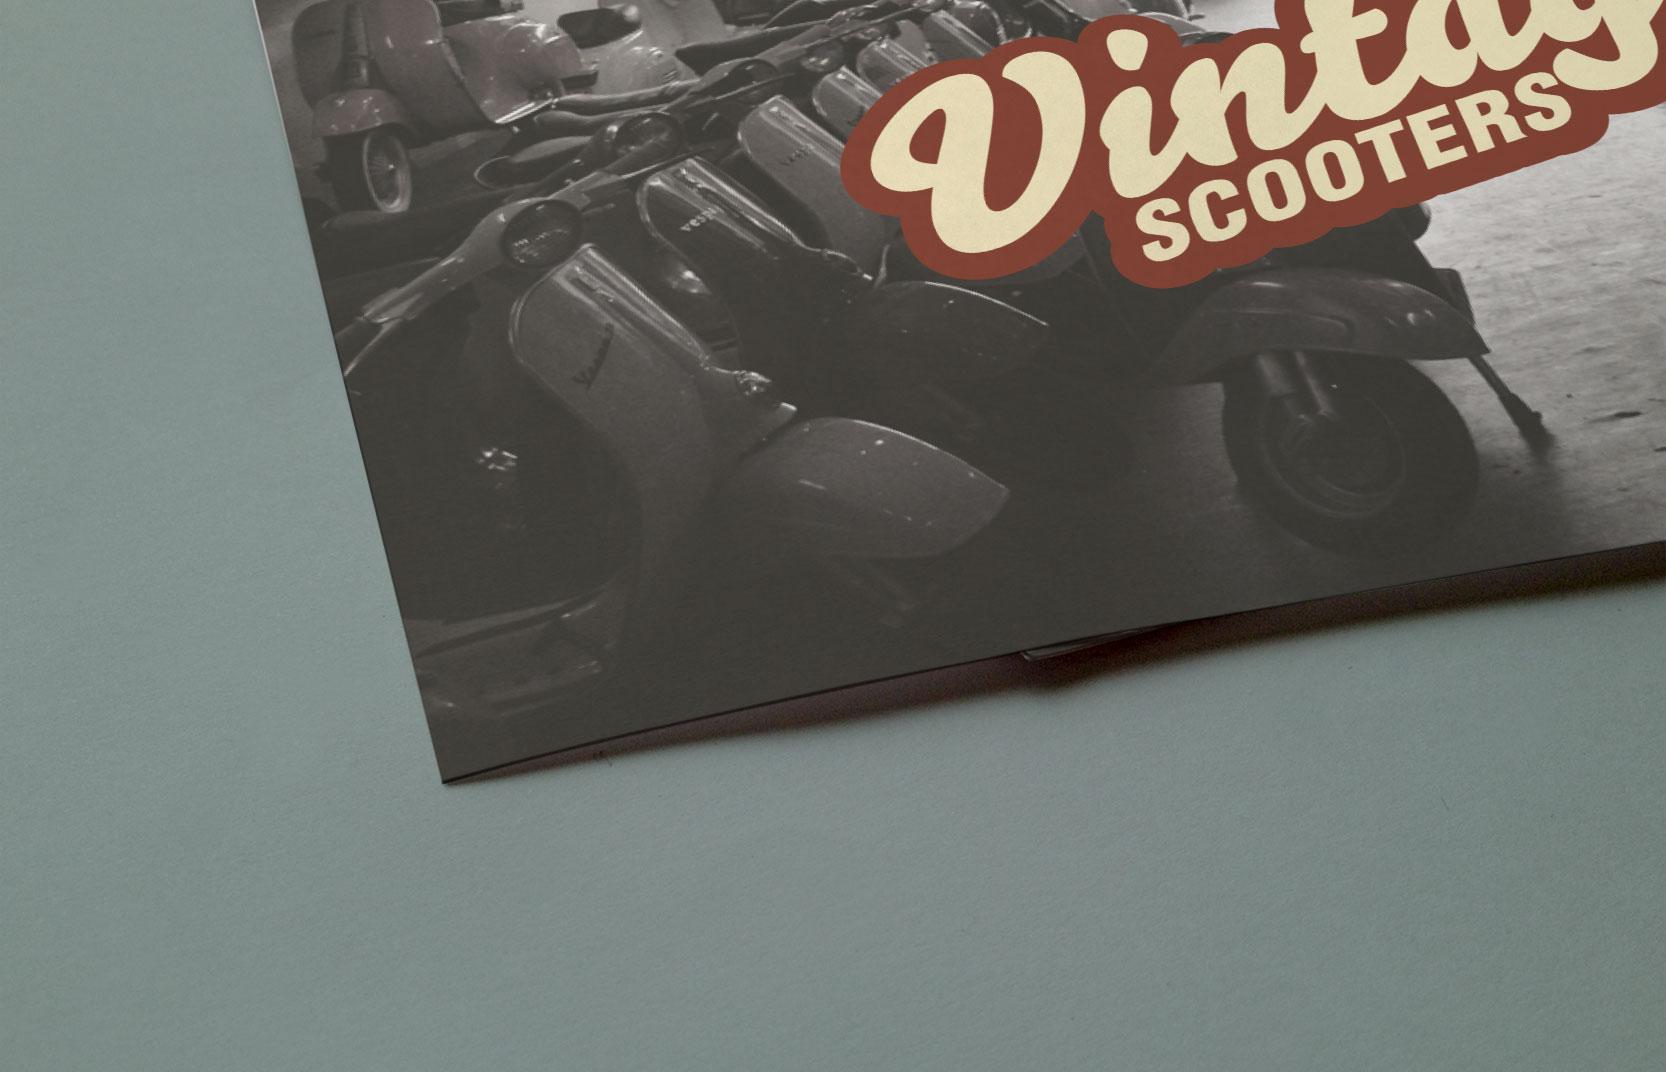 multi_vintage-scooters_macro